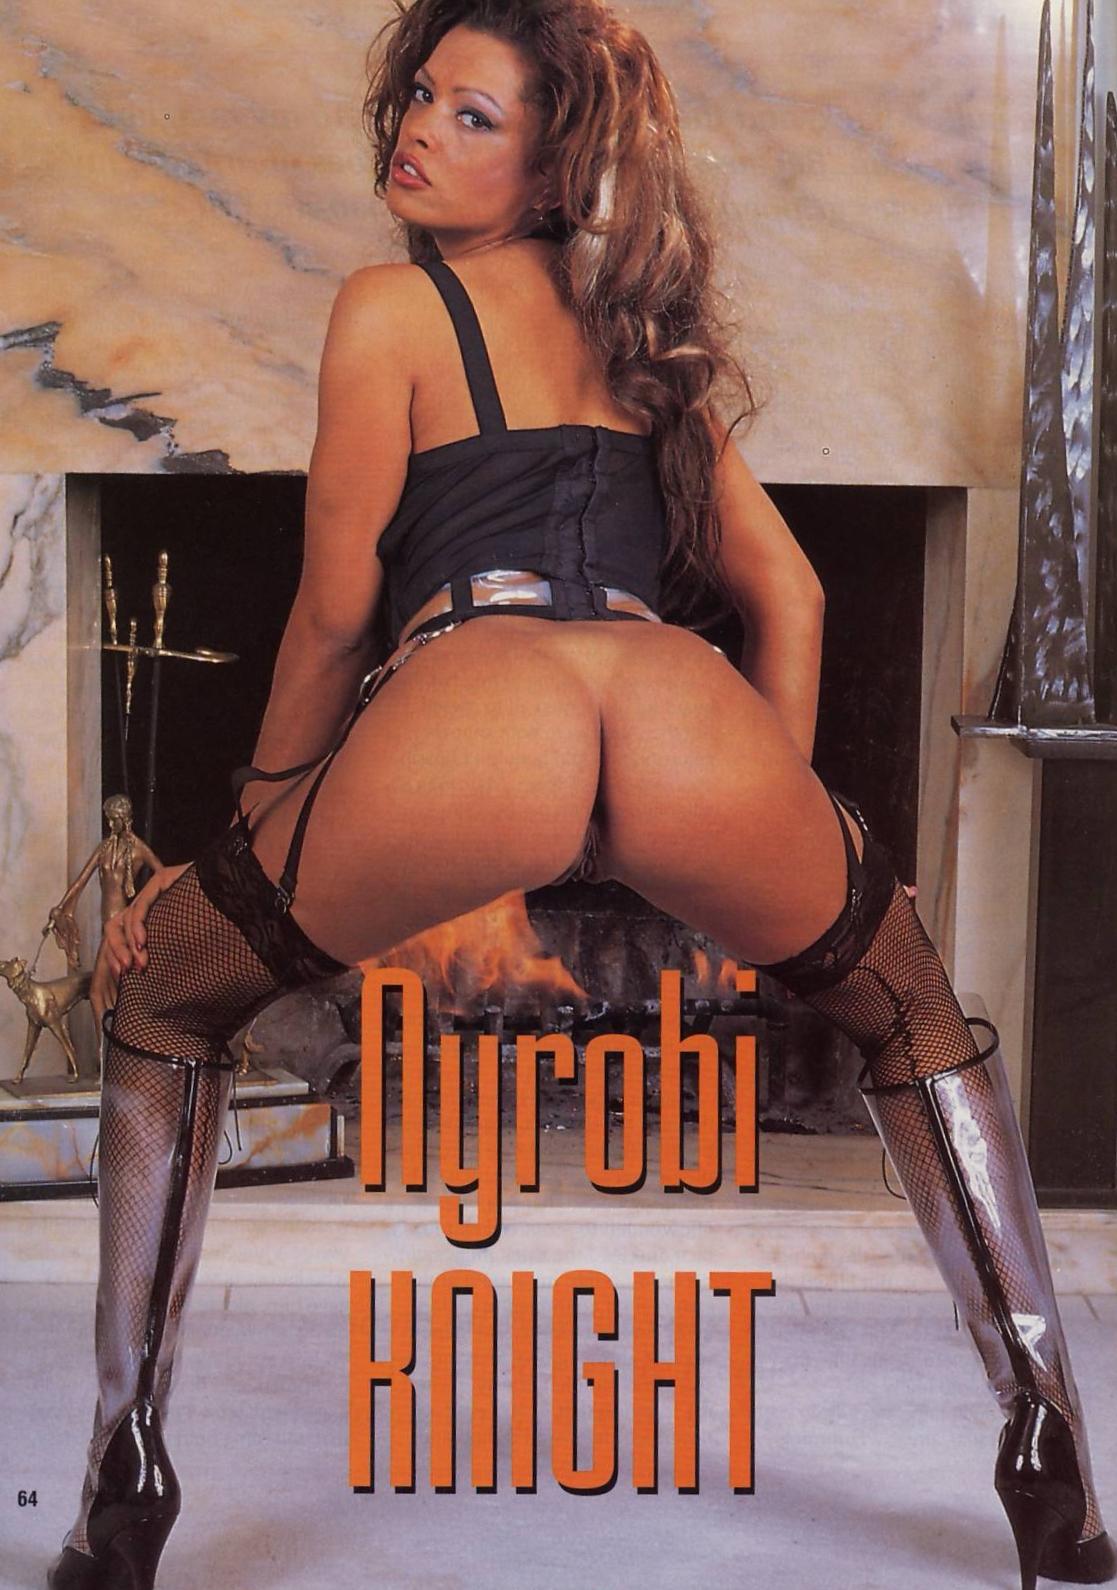 Pornstar nyrobi knight adult tube